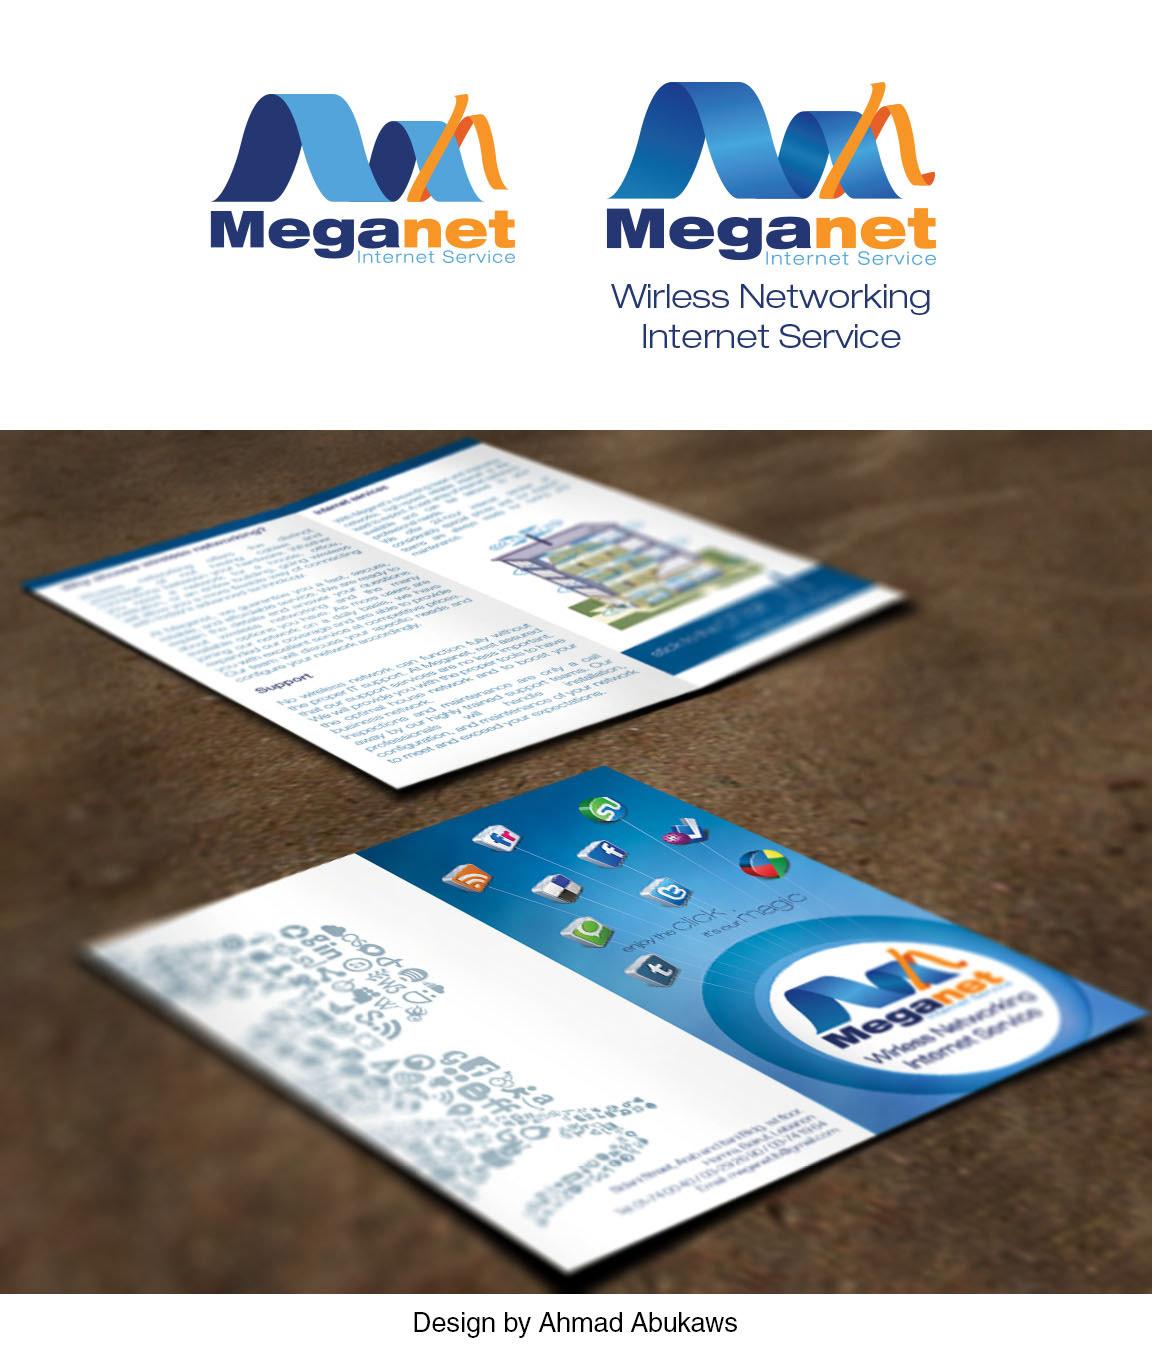 Pix Rip   graphic design, 3d modeling - MegaNet